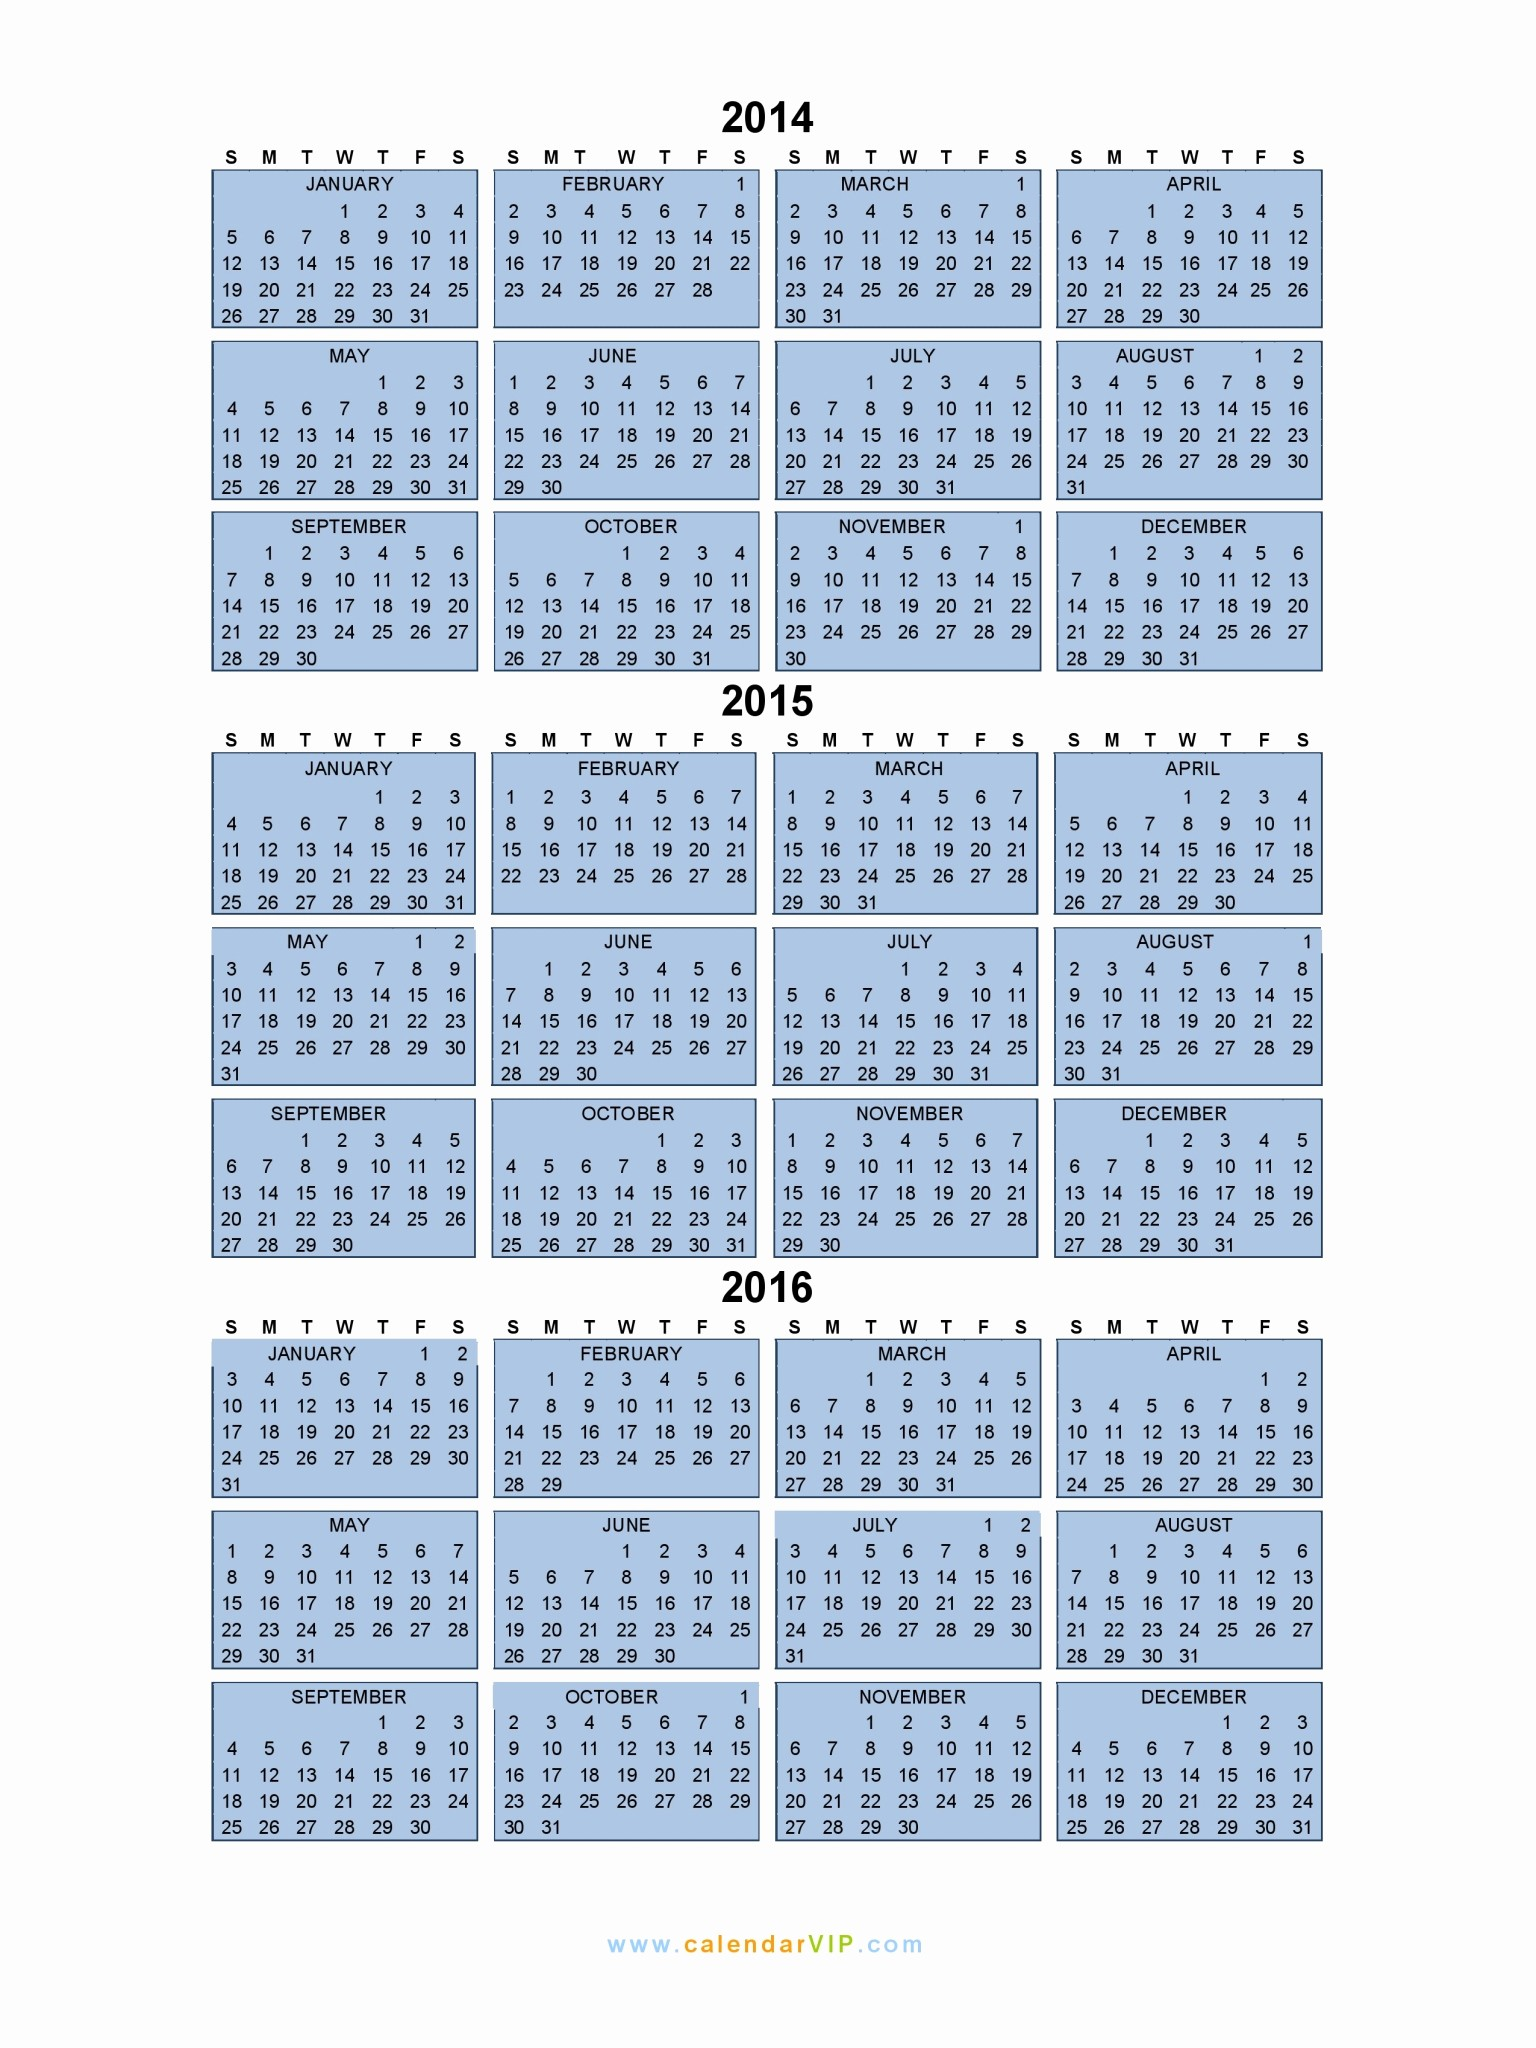 Full Year Calendar Template 2015 Lovely 2015 Calendar Blank Printable Calendar Template In Pdf